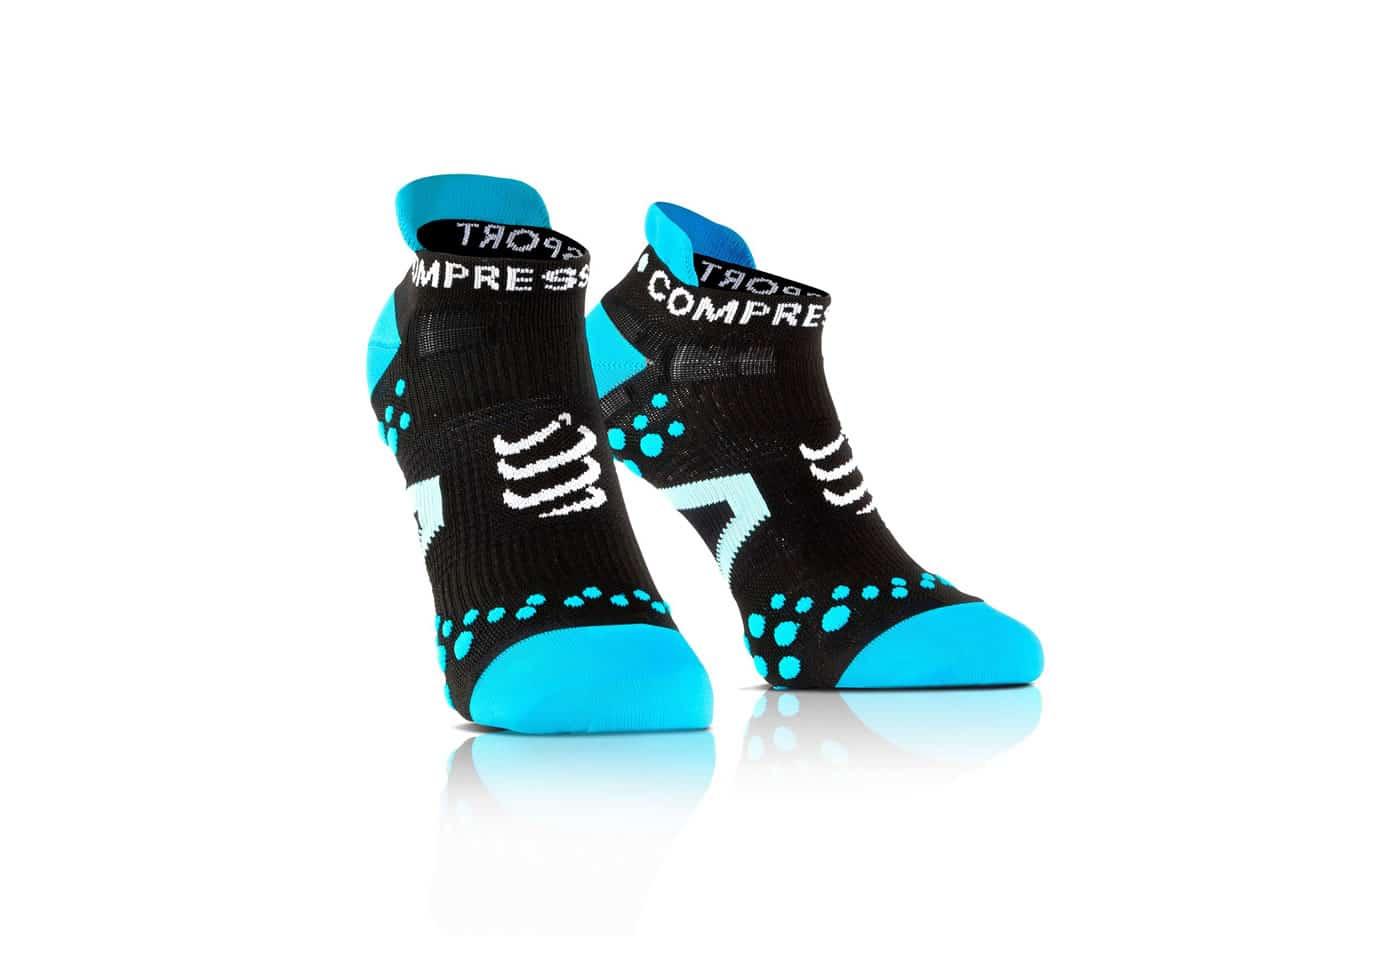 Calcetines Bajos Compressport Proracing Socks V2_1 negro-azul